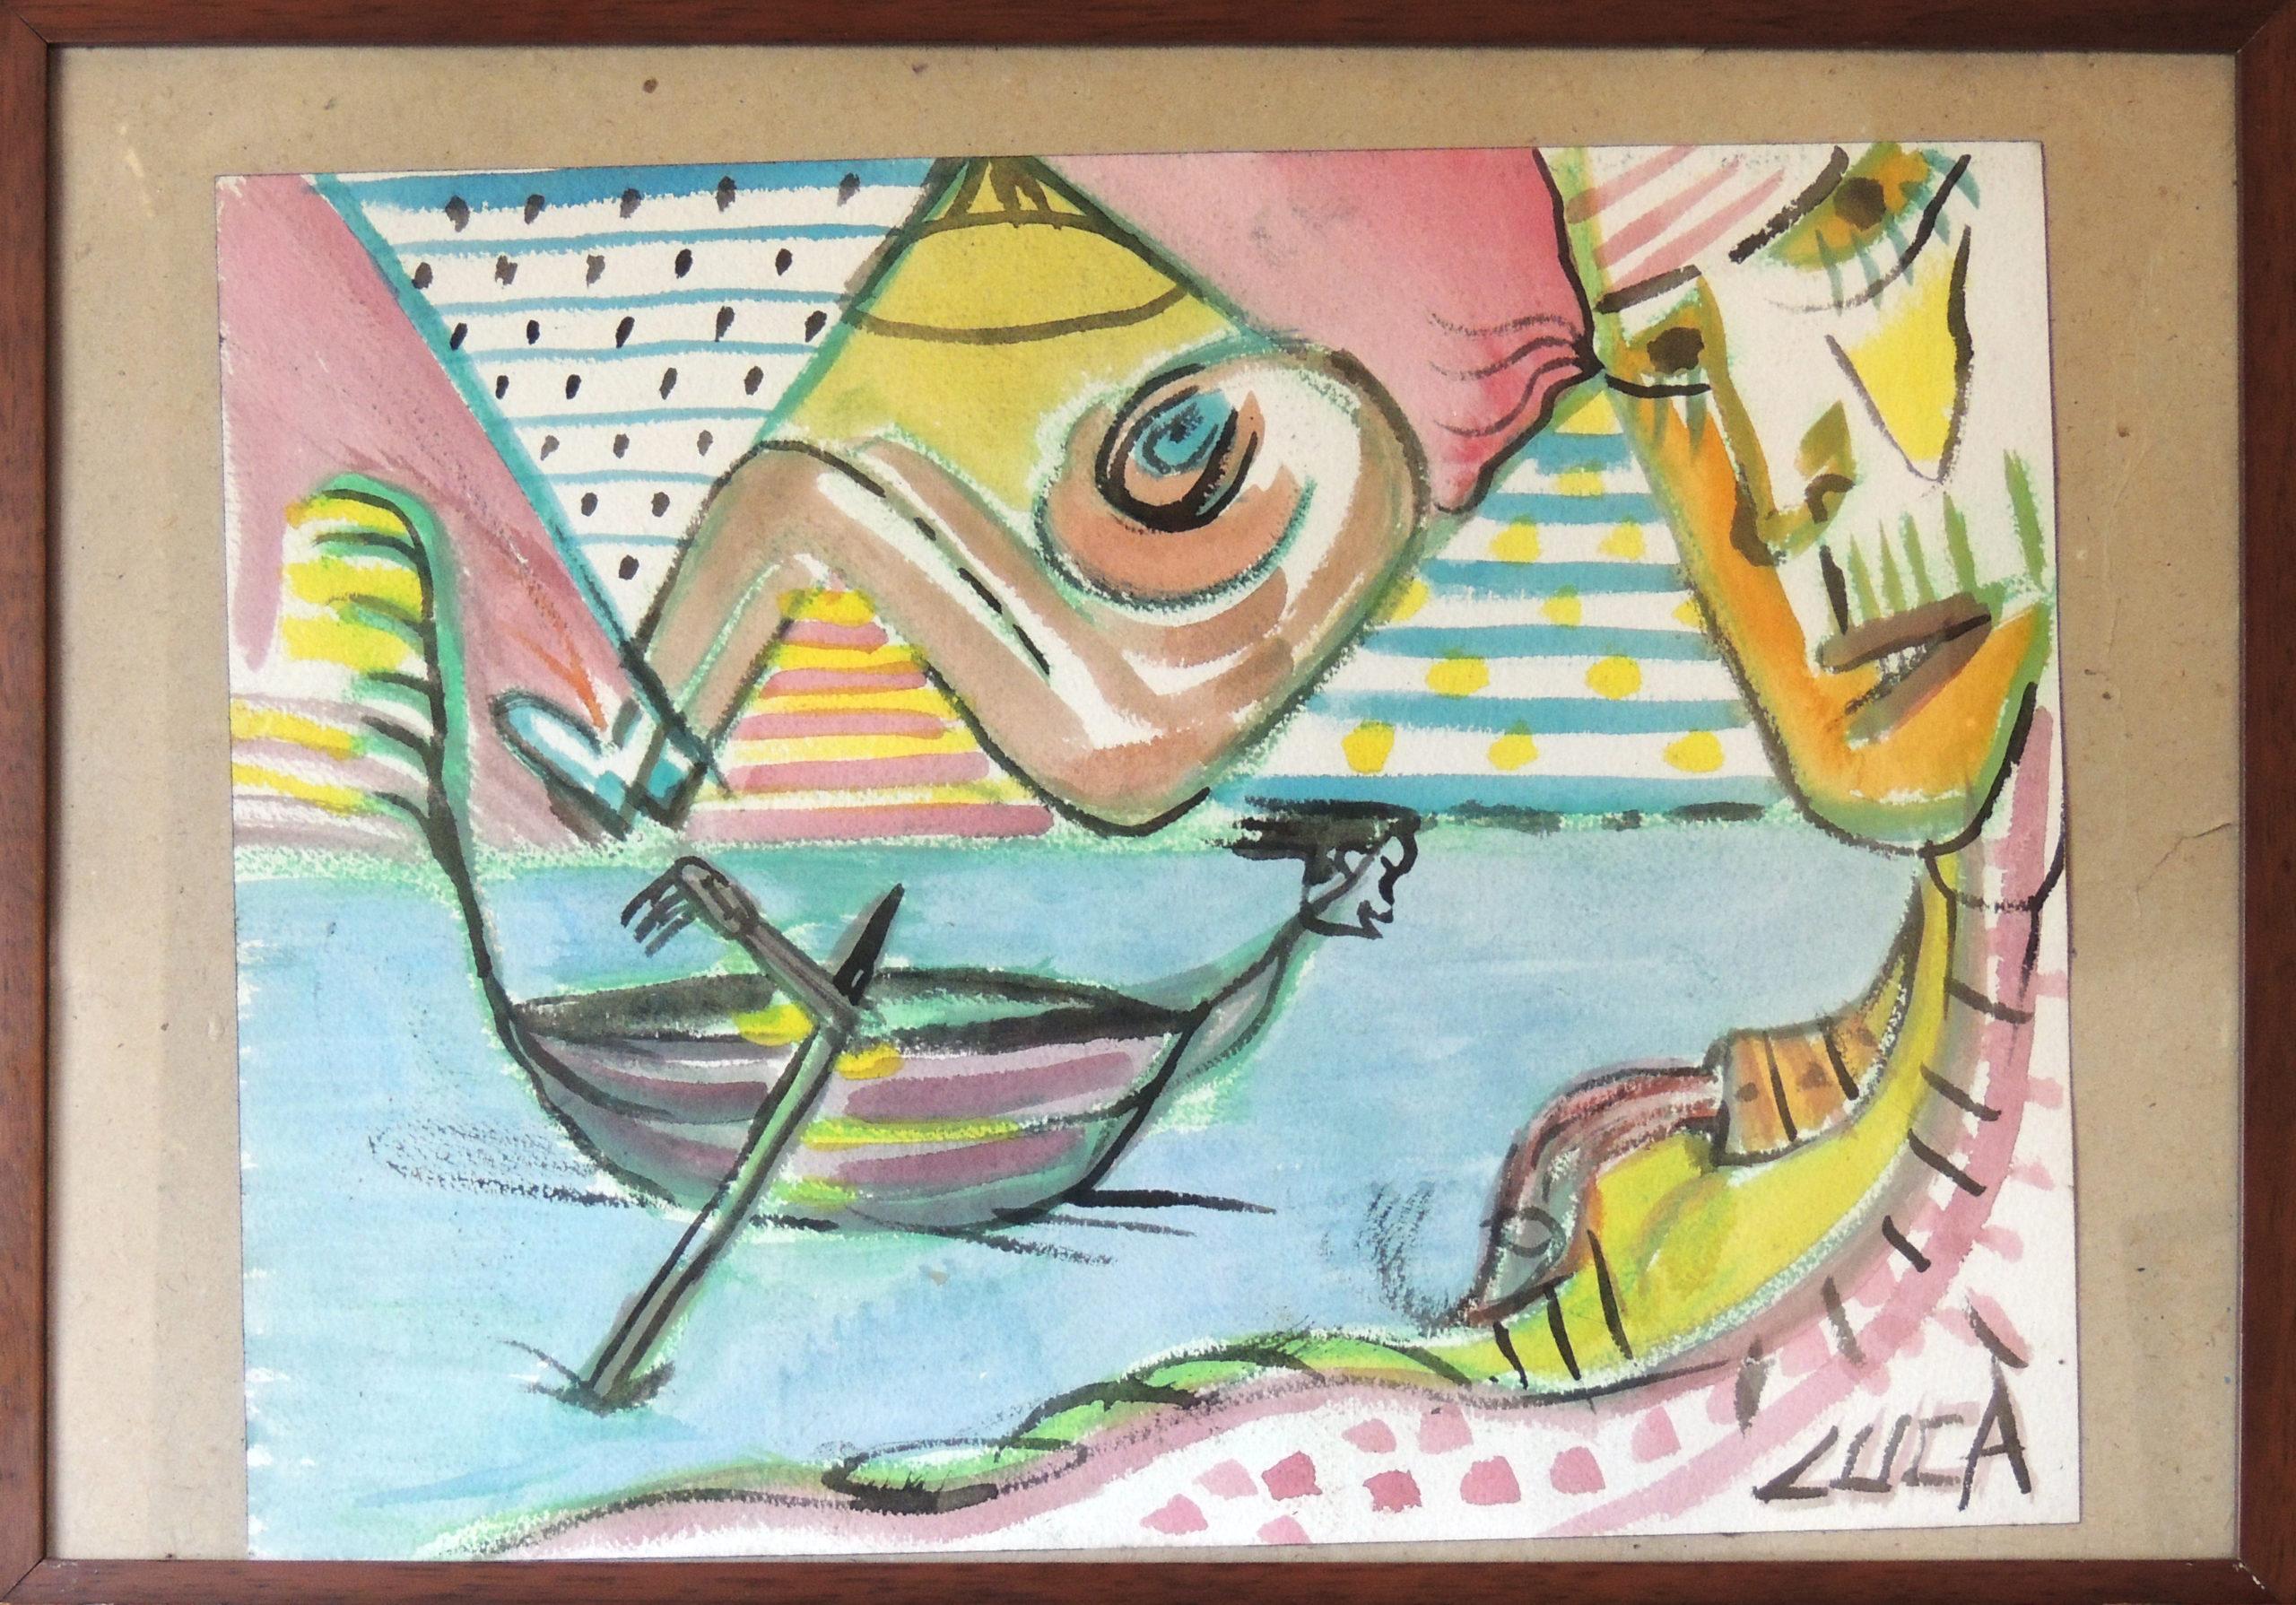 La gondola - acquerello